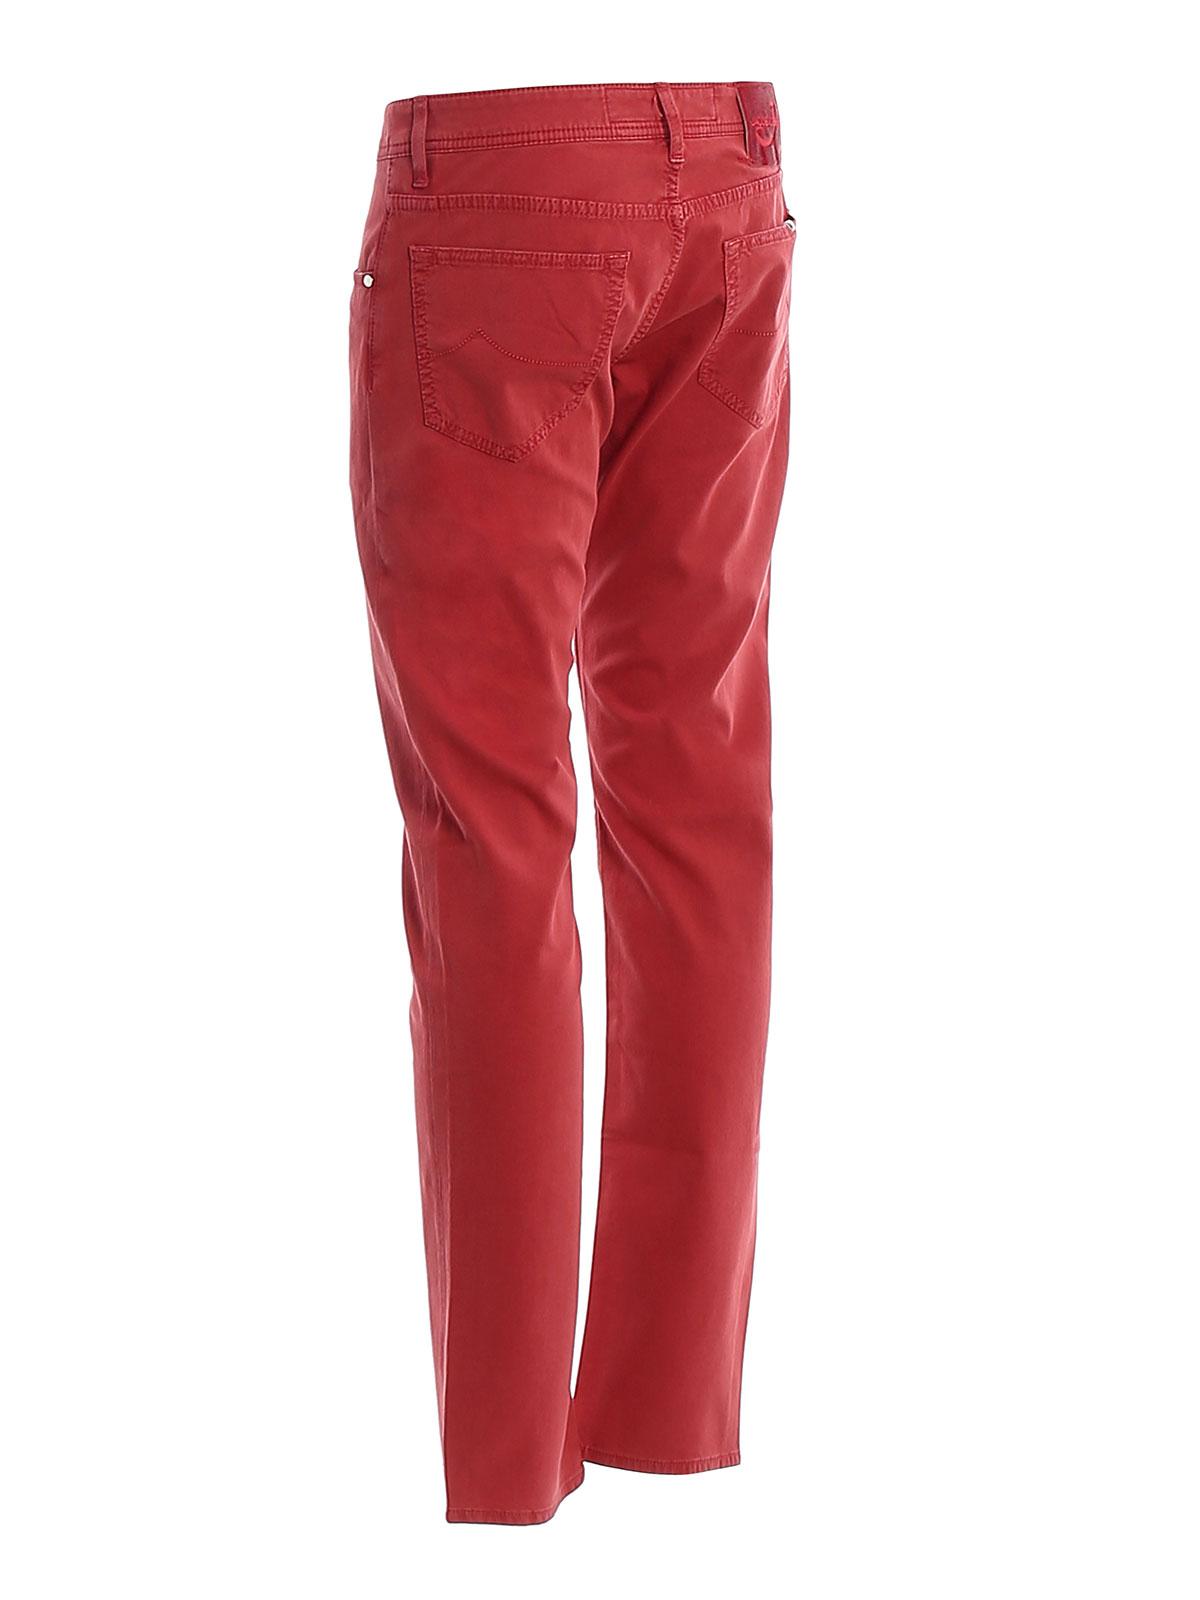 Immagine di JACOB COHEN   Pantaloni Uomo Style 622 Jacquard